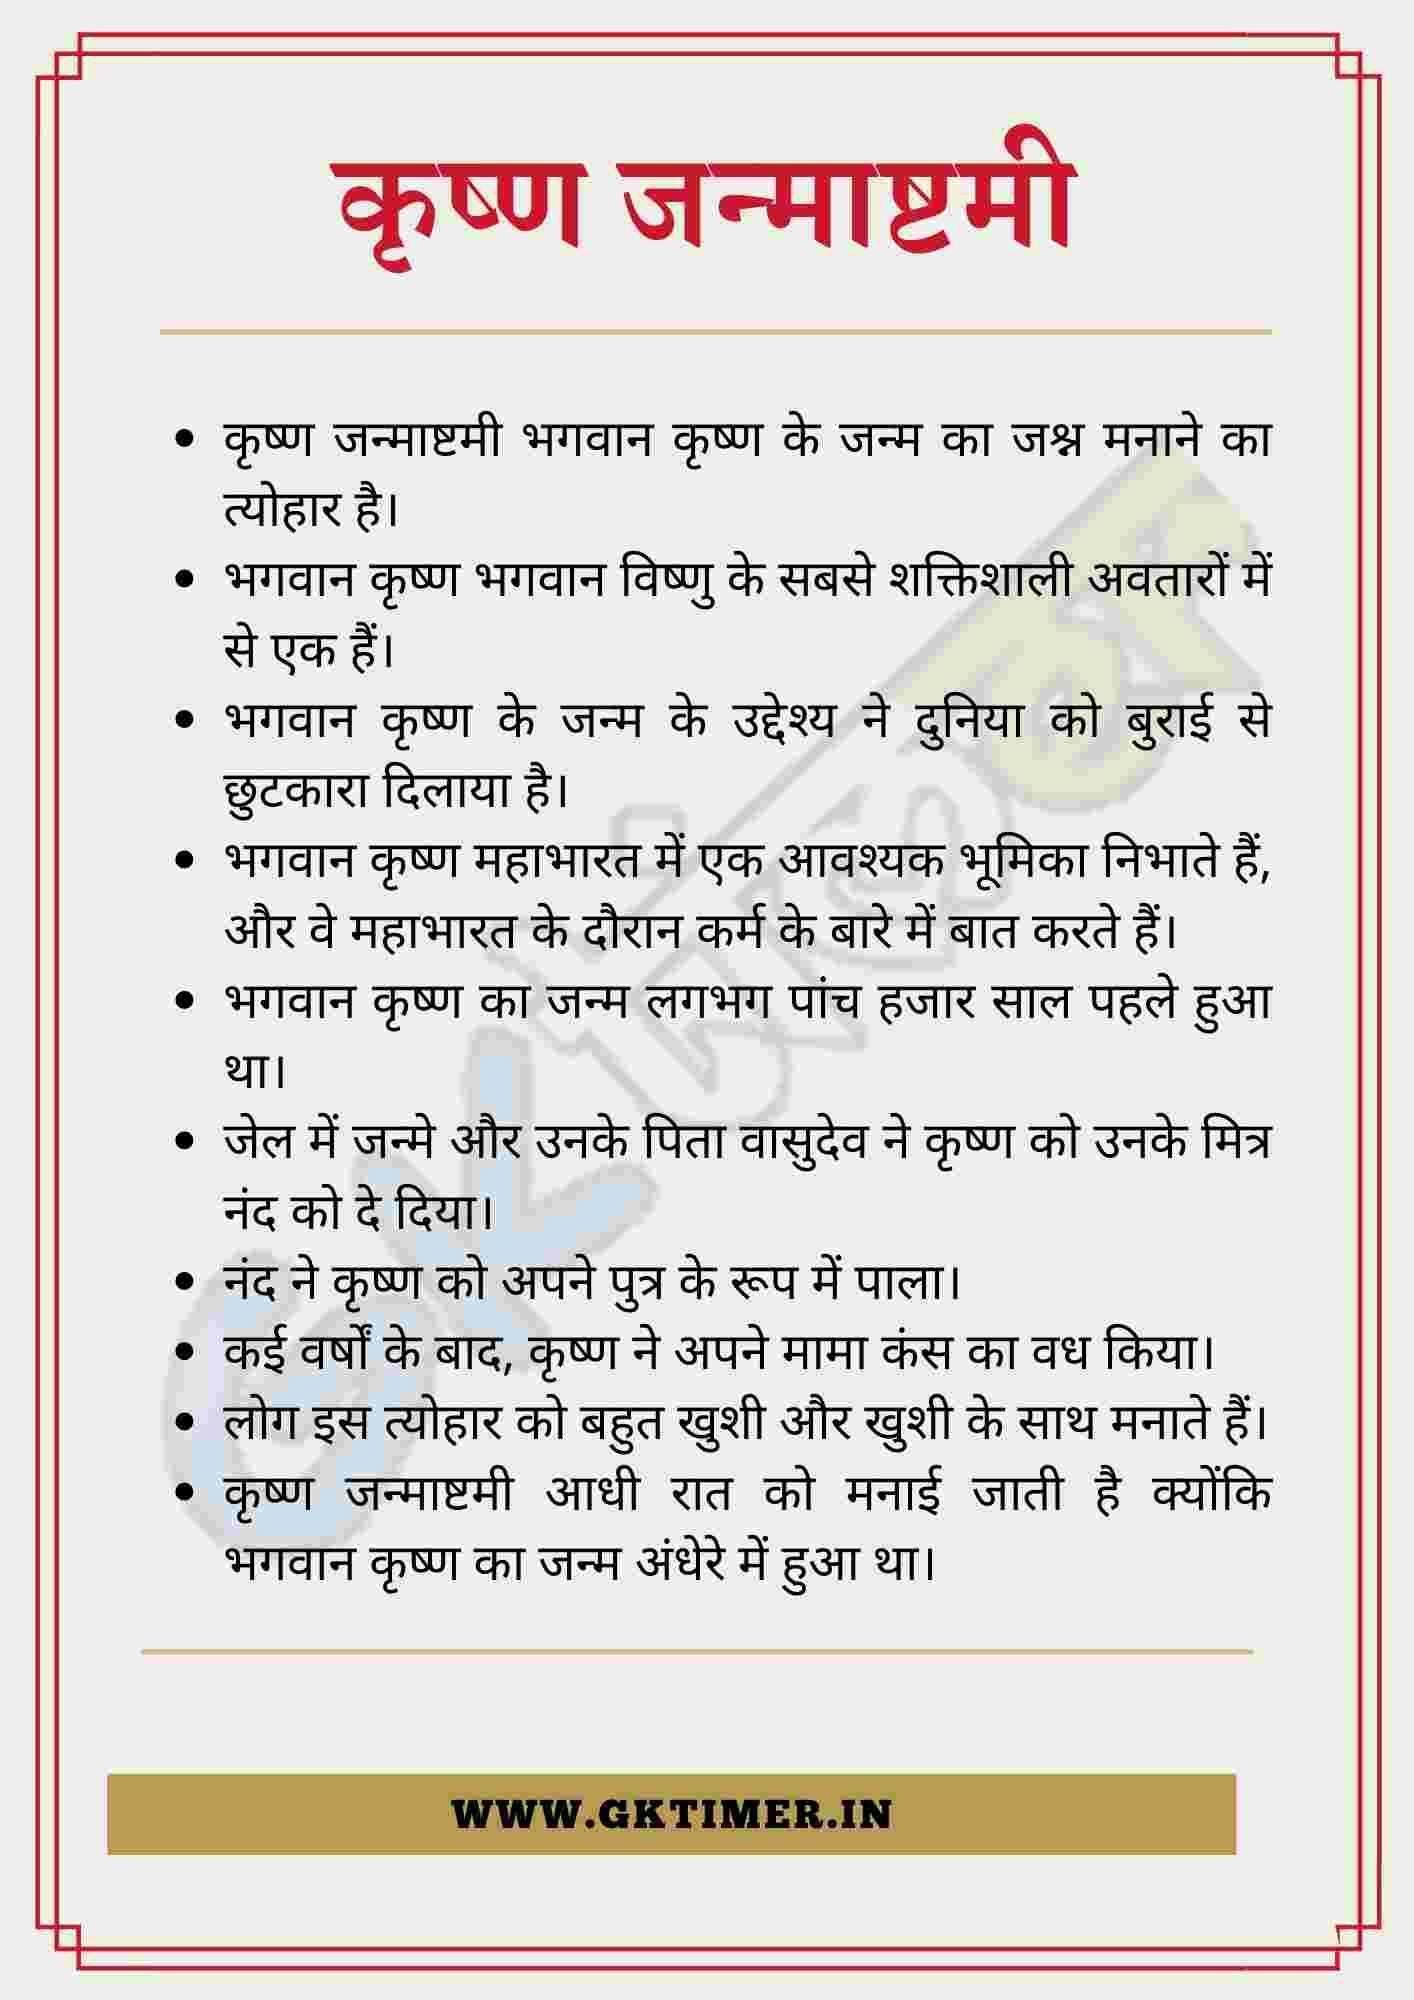 कृष्ण जन्माष्टमी पर निबंध | Krishna Janmashtami Essay in Hindi | 10 Lines on Krishna Janmashtami in Hindi